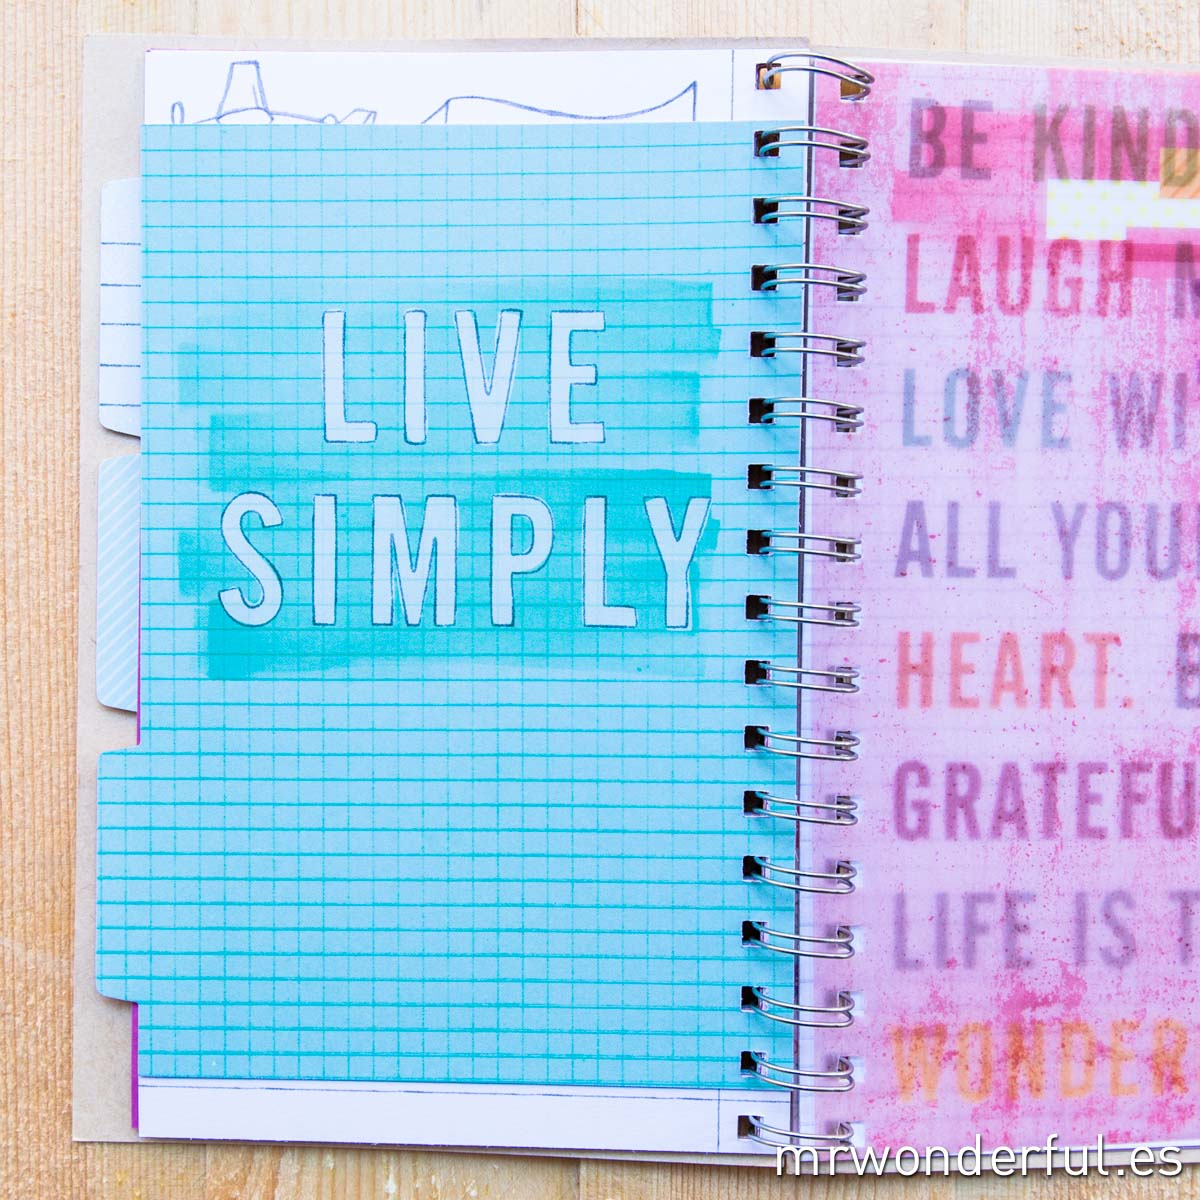 mrwonderfulshop_35957_album_con_aspiral_para_personalizar_day_book_07